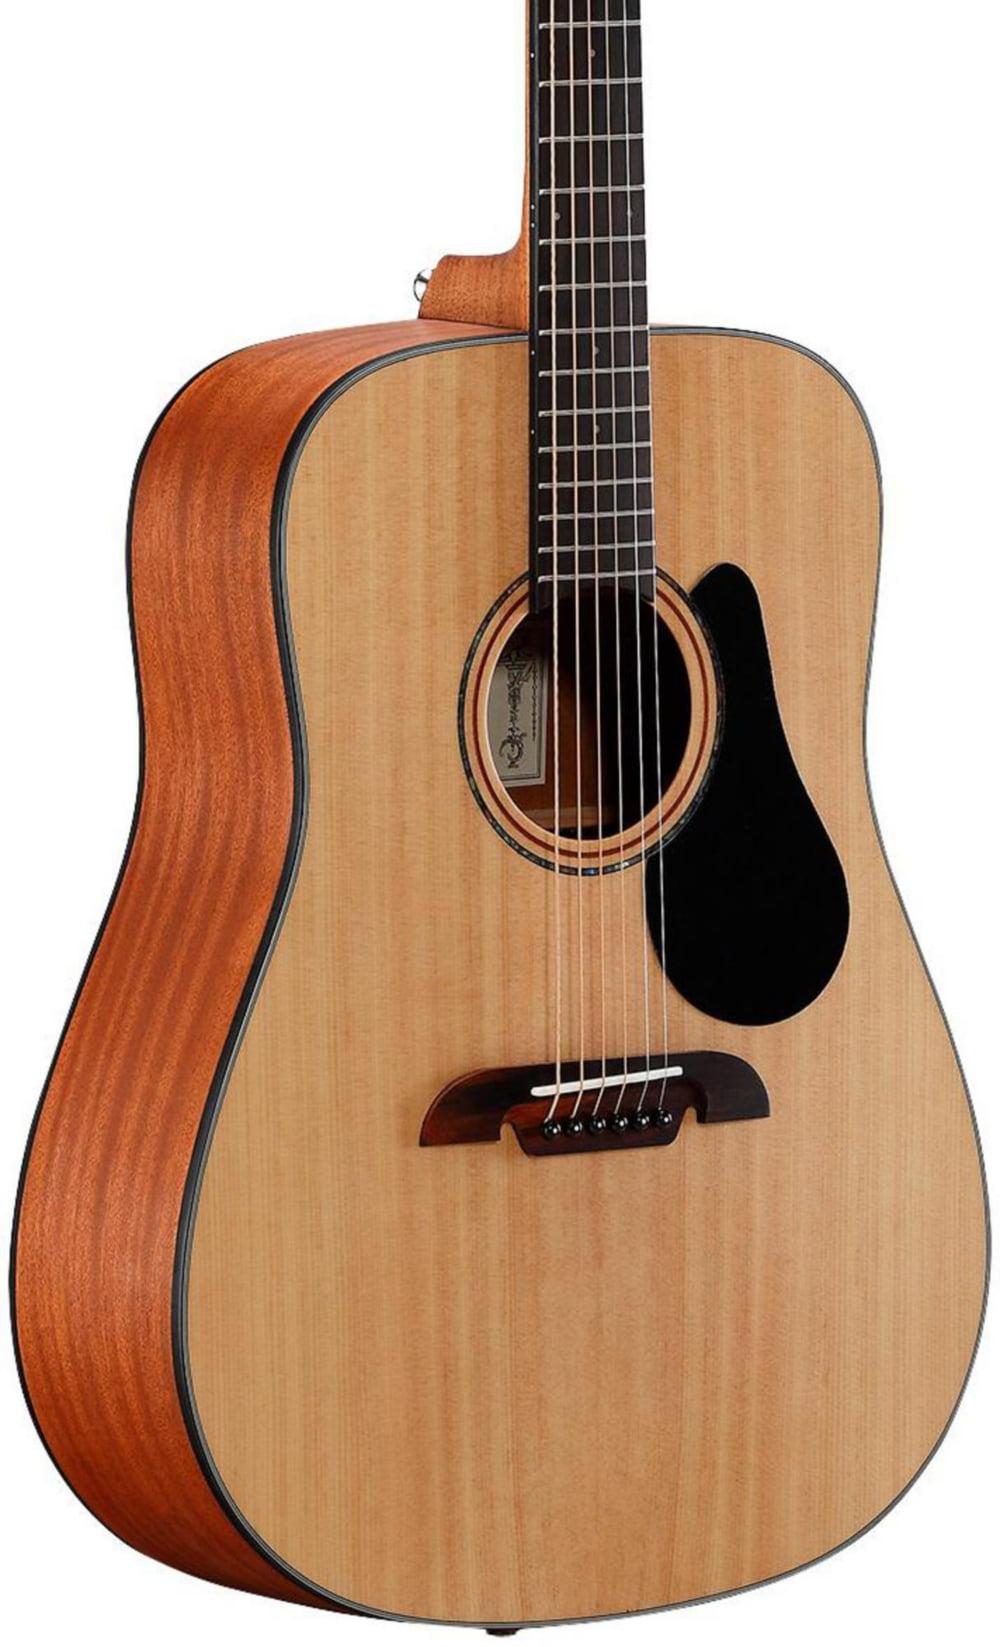 Artist Series AD30 Dreadnought Acoustic Guitar Natural by Alvarez